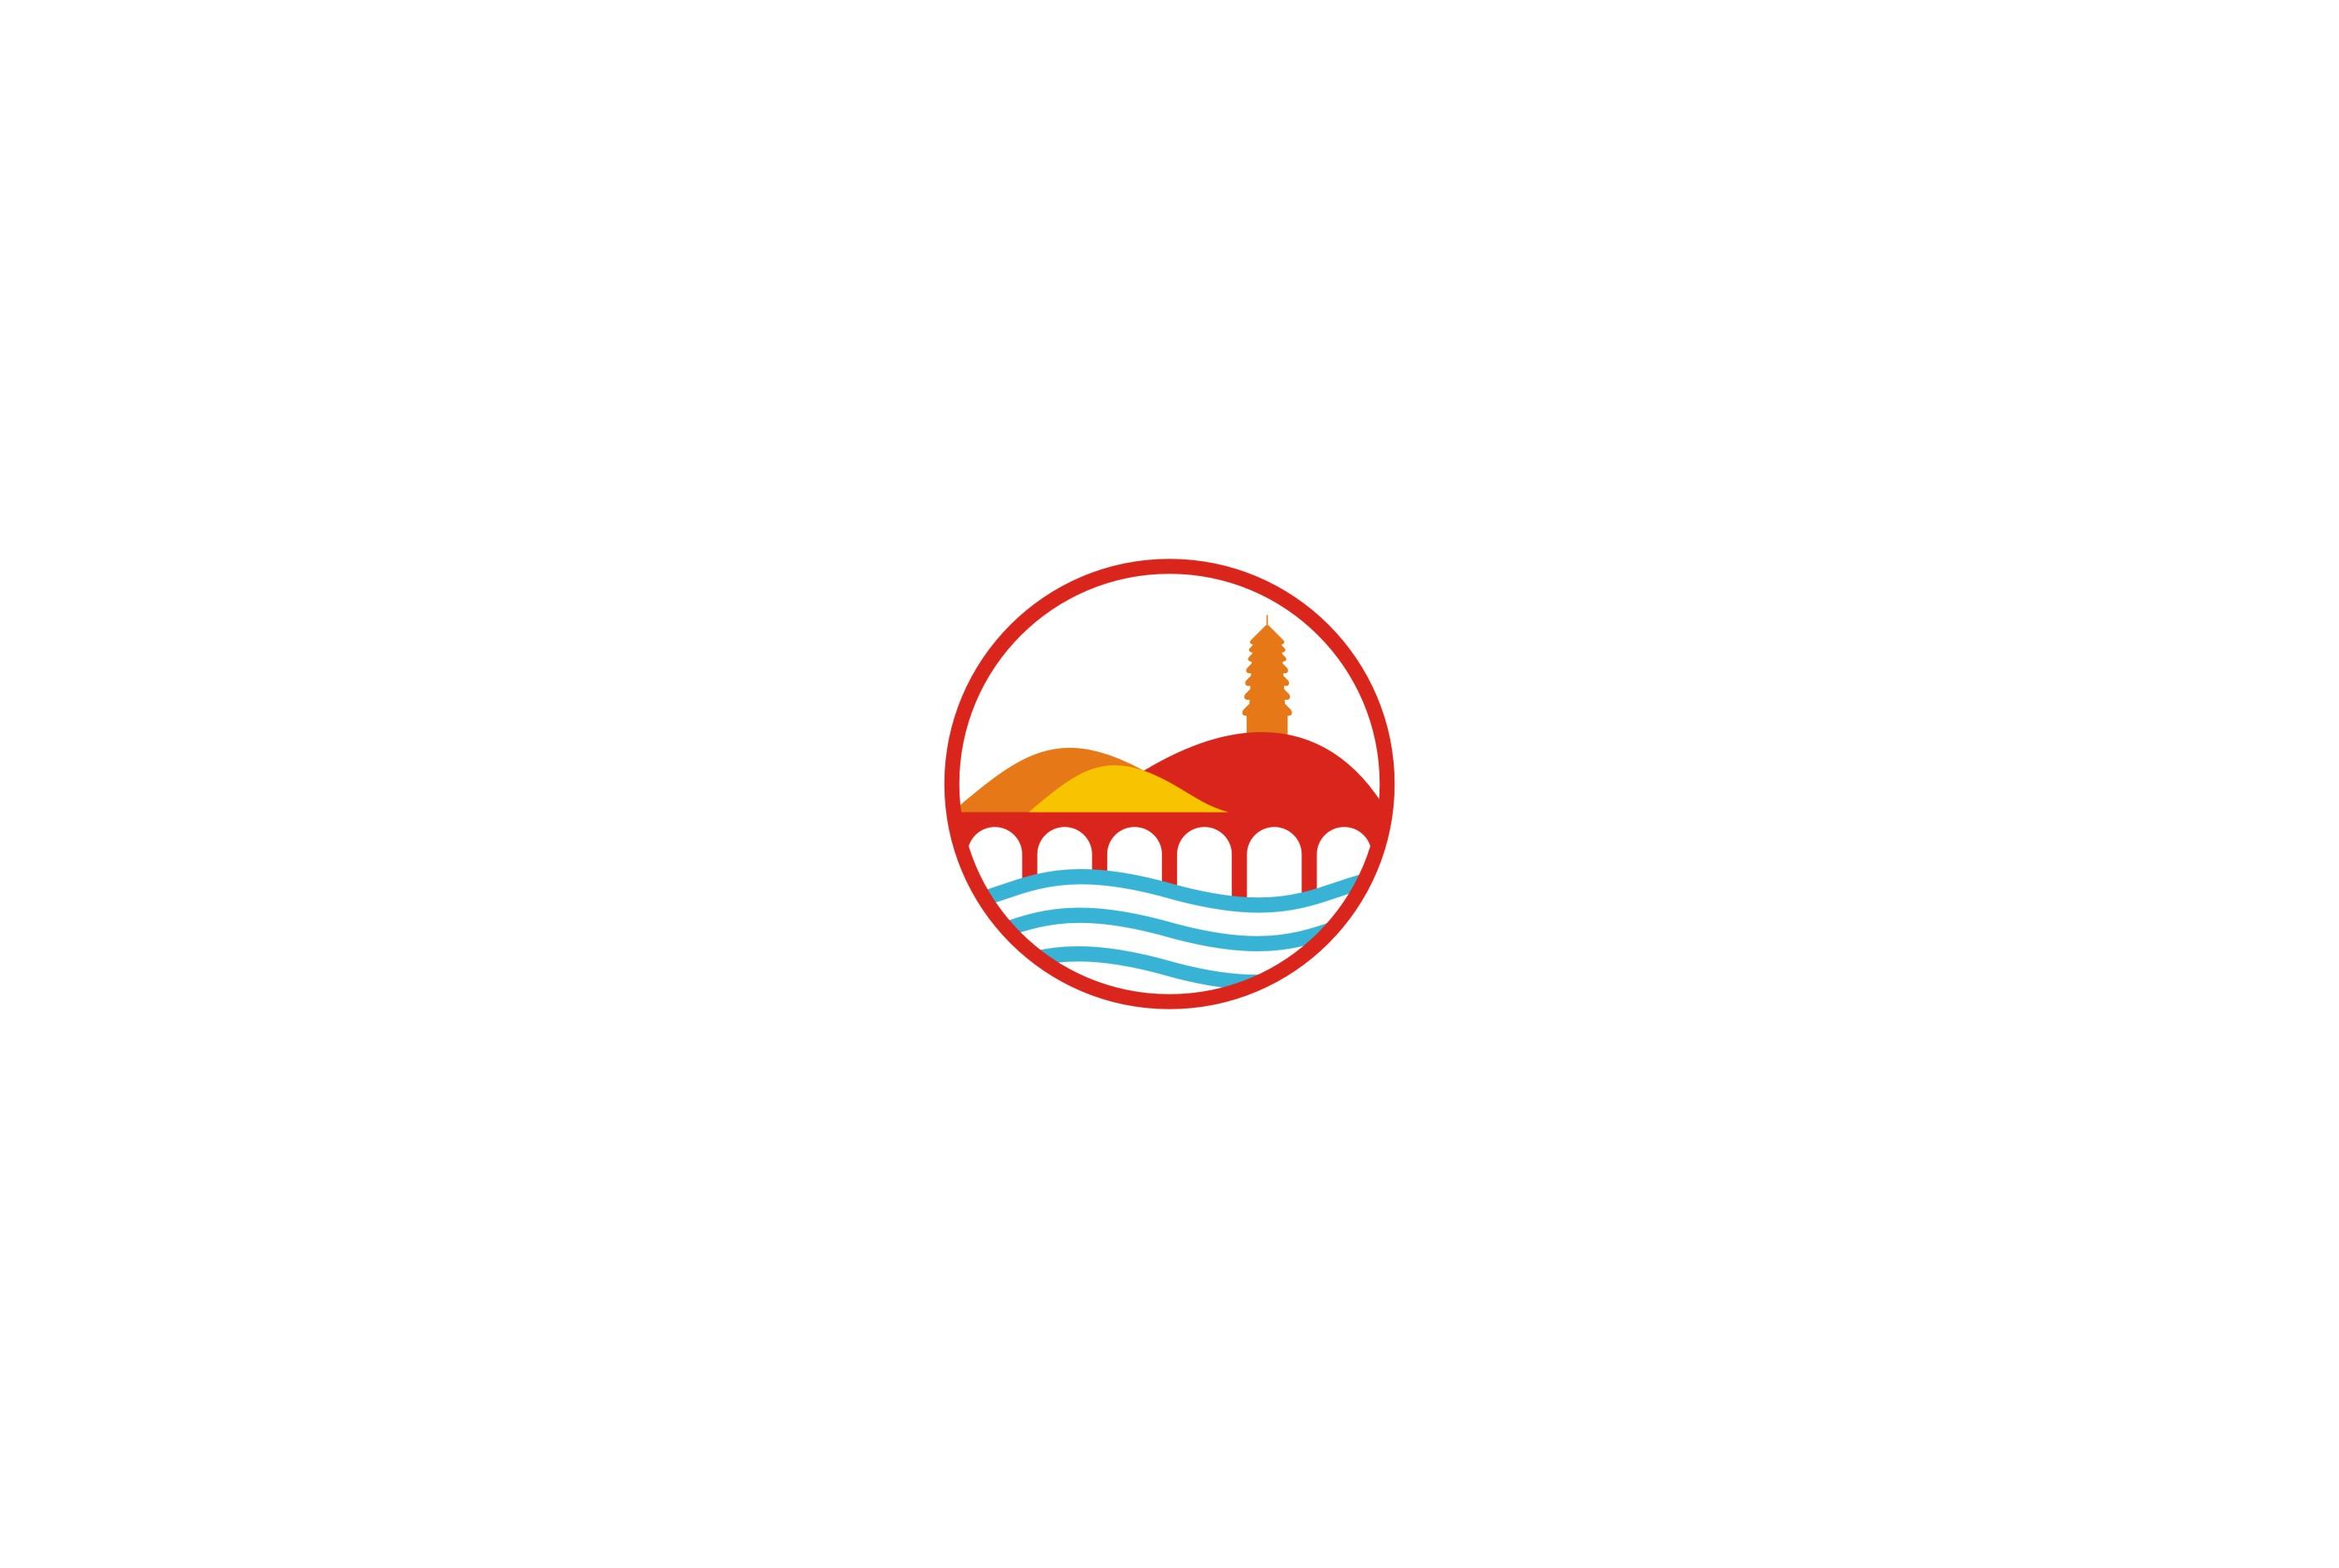 logo logo 标志 设计 图标 2818_1889图片